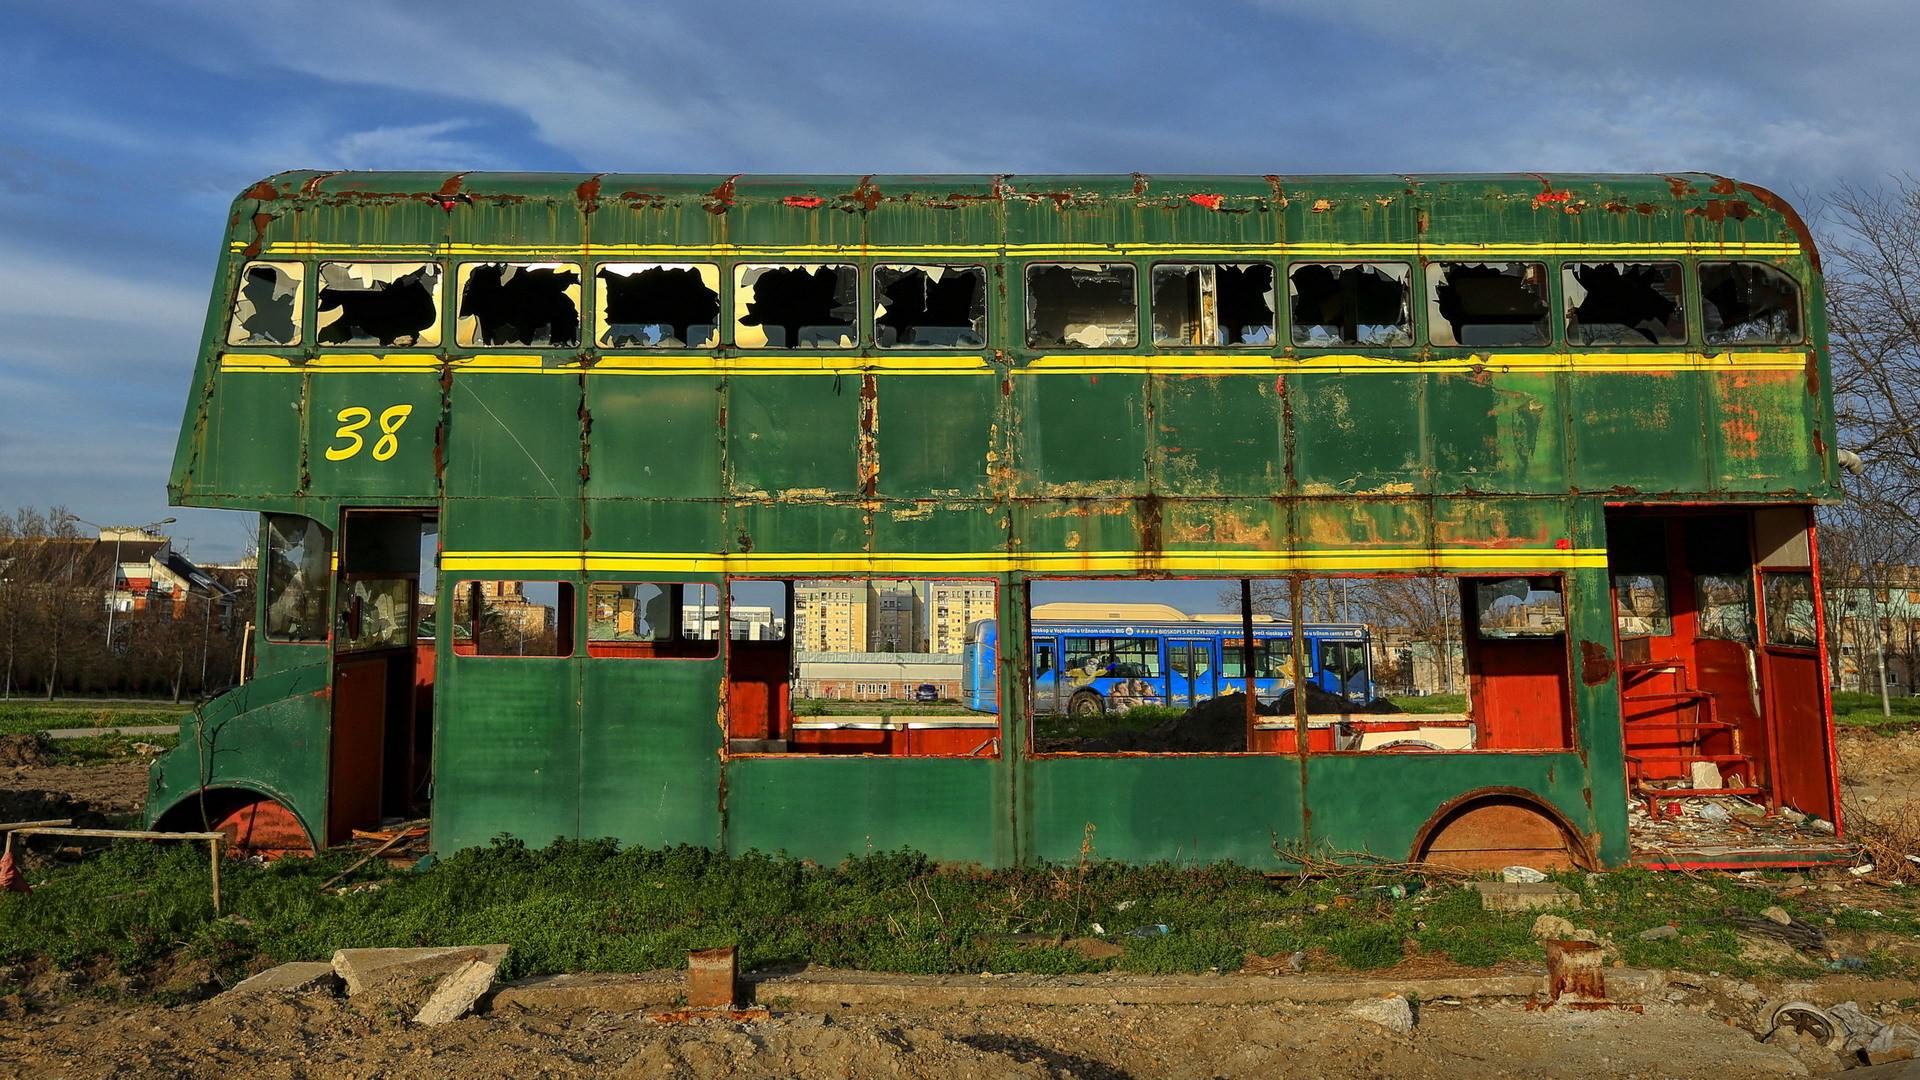 Zeleni autobus plave boje